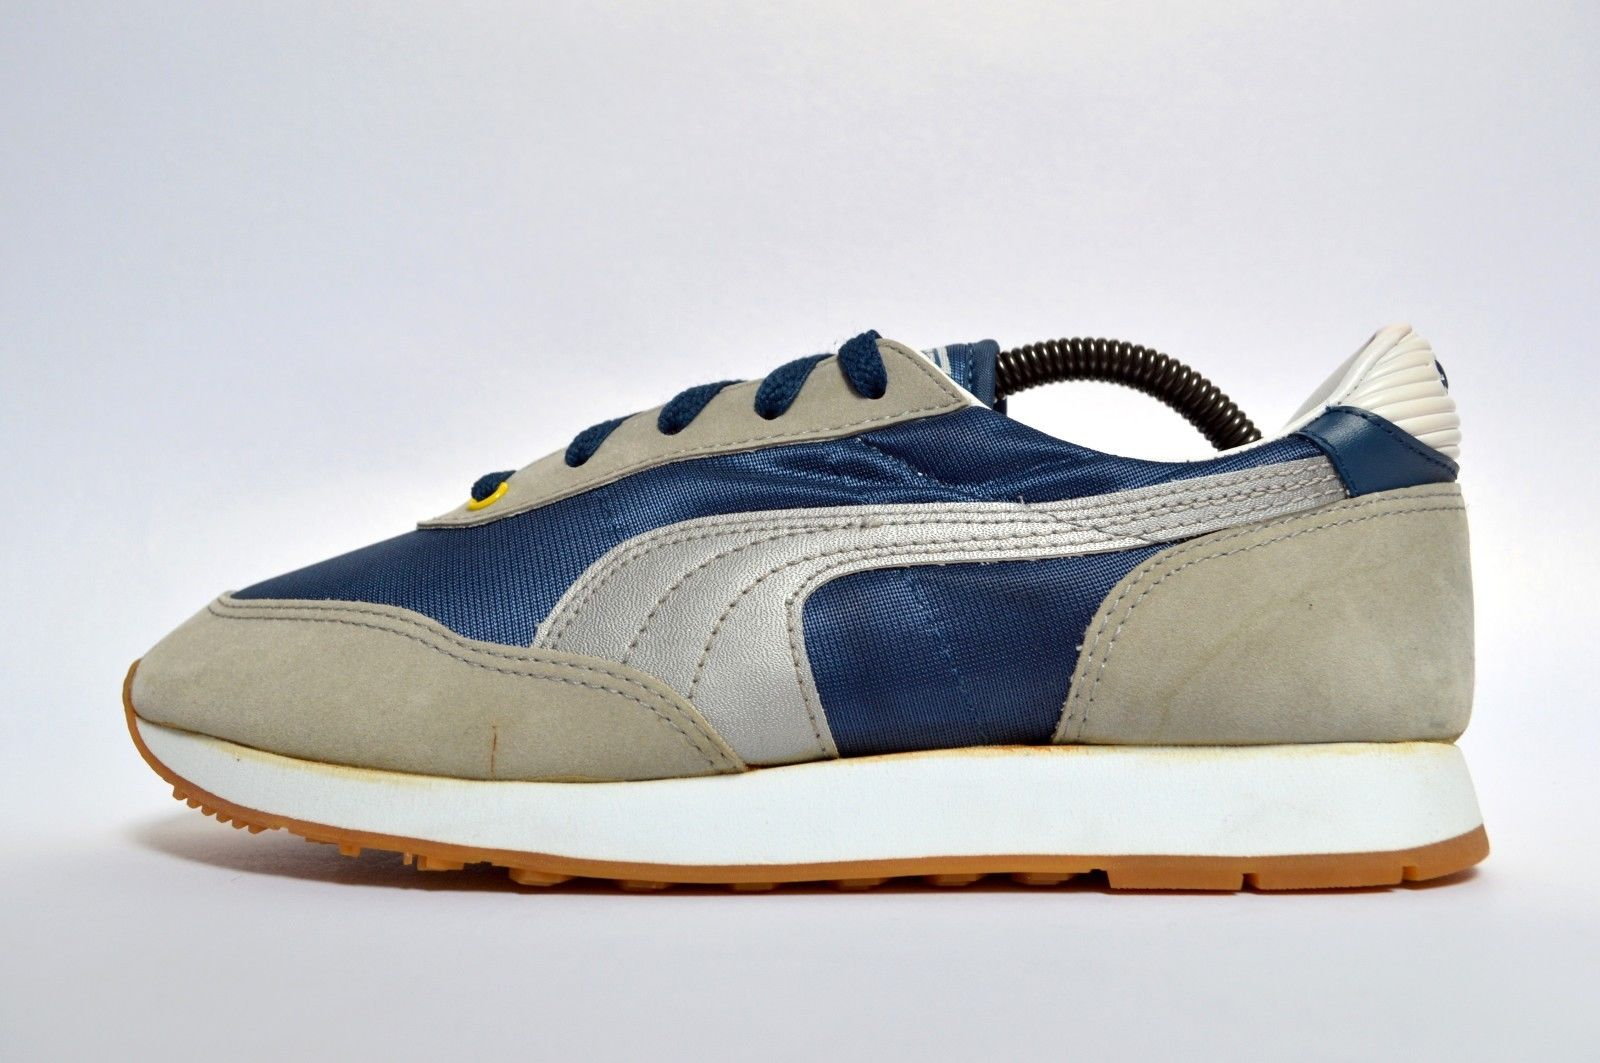 Puma shoe styles vintage. 80's clipart blue sneaker